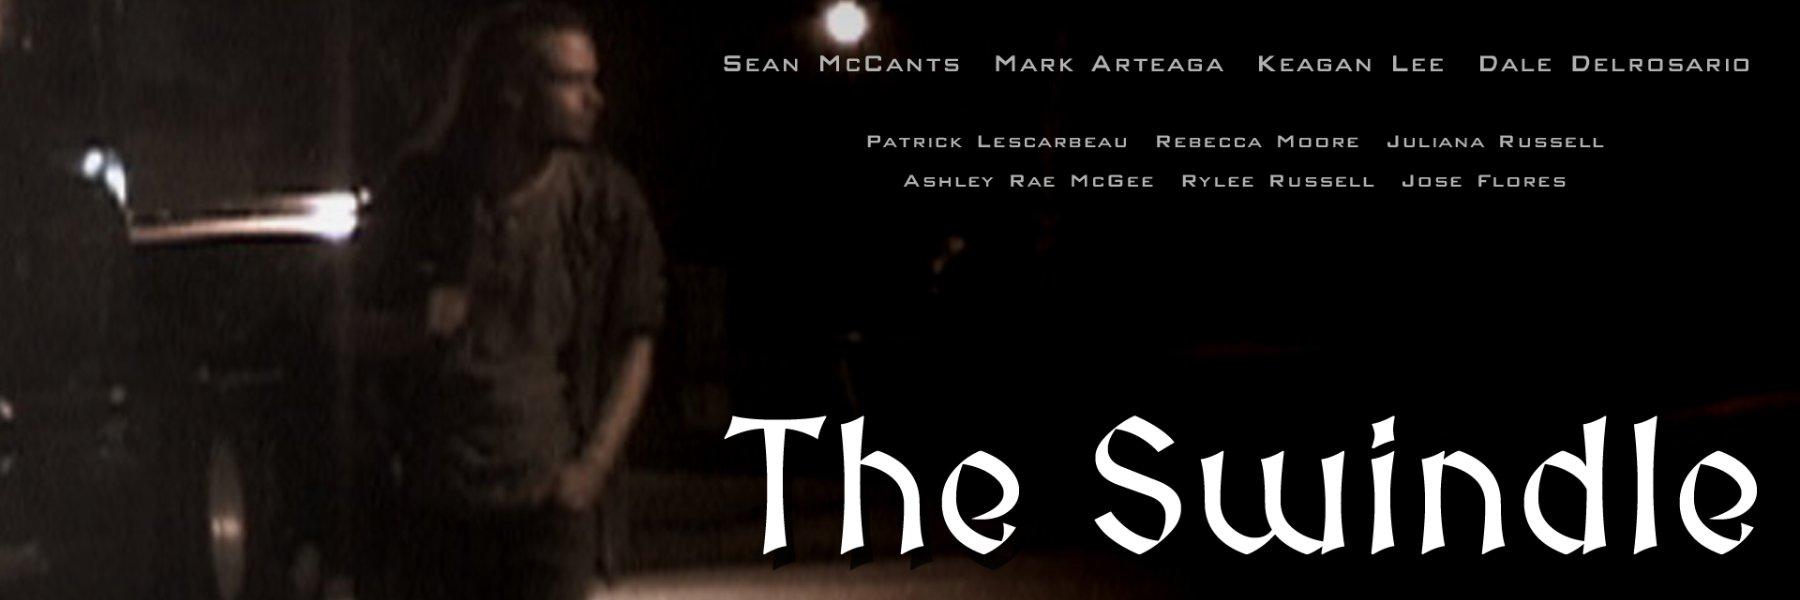 The Swindle - Full Movie